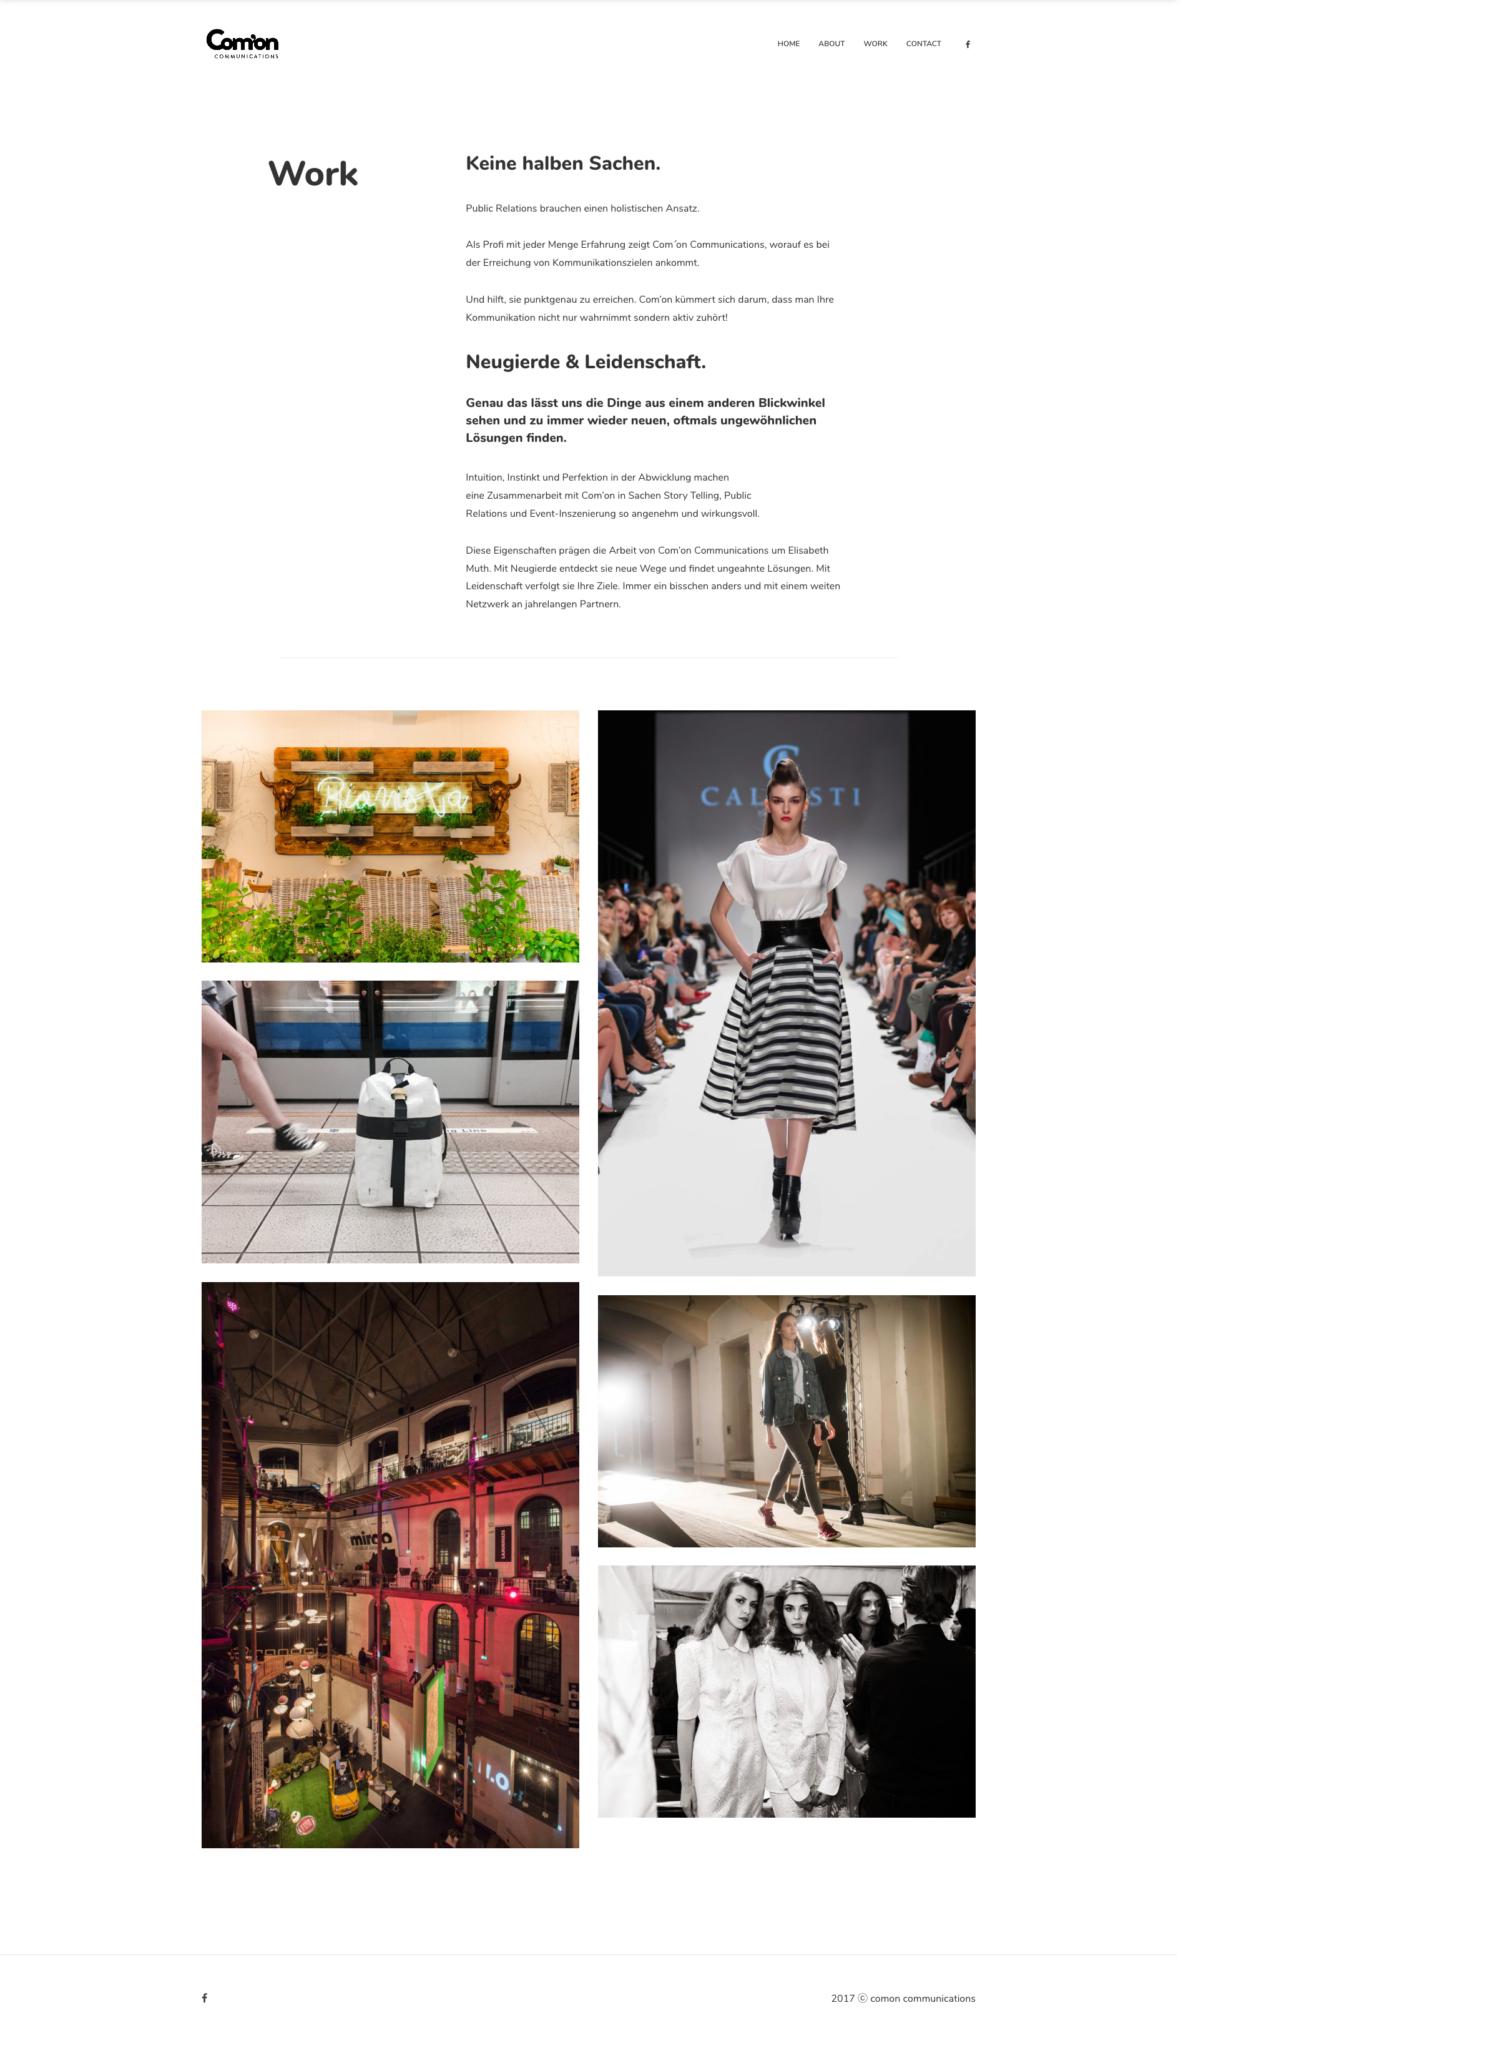 comon communications Website Design 36 digital&more